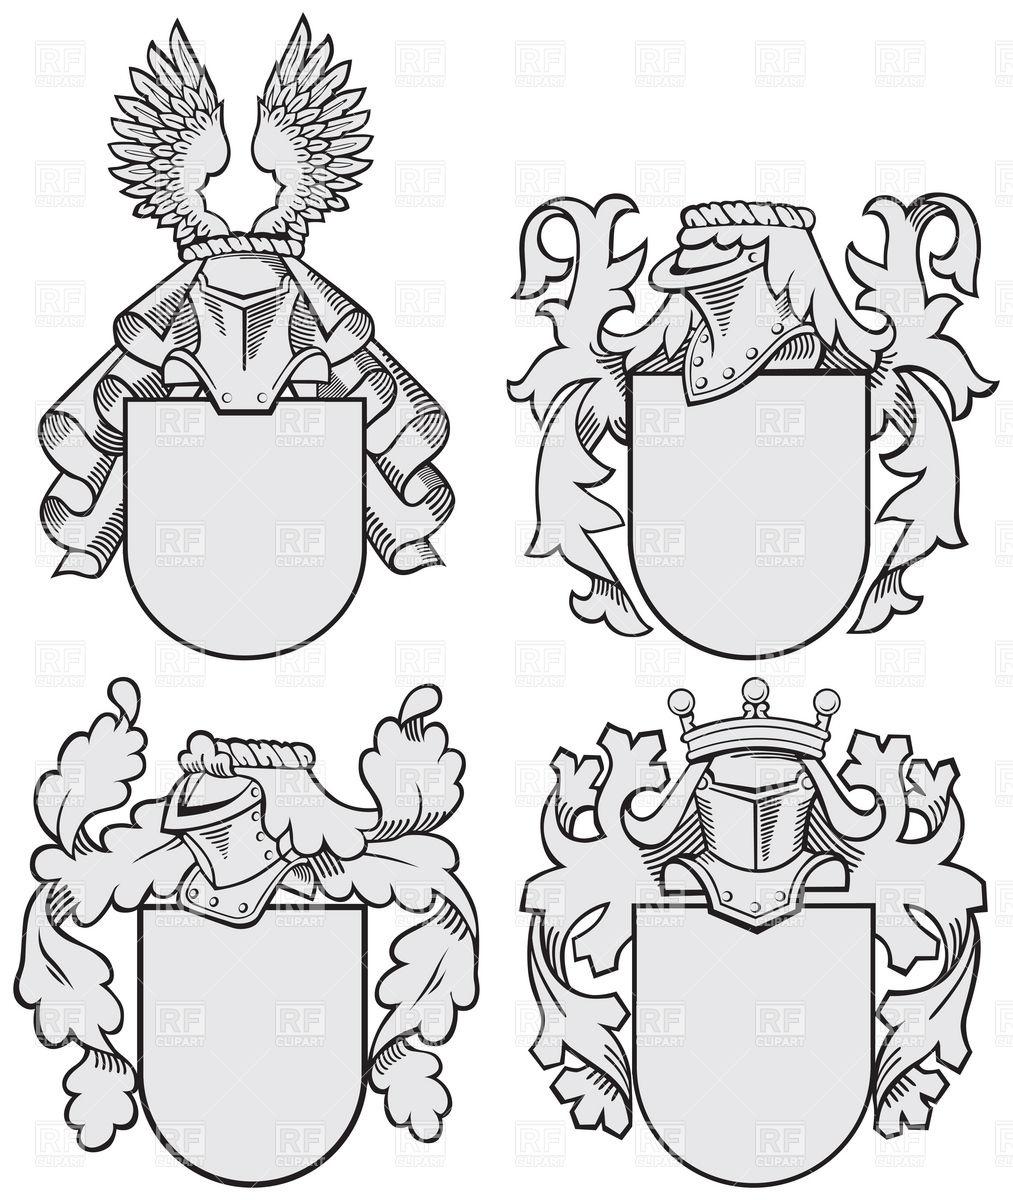 1013x1200 Heraldic Elements Templates